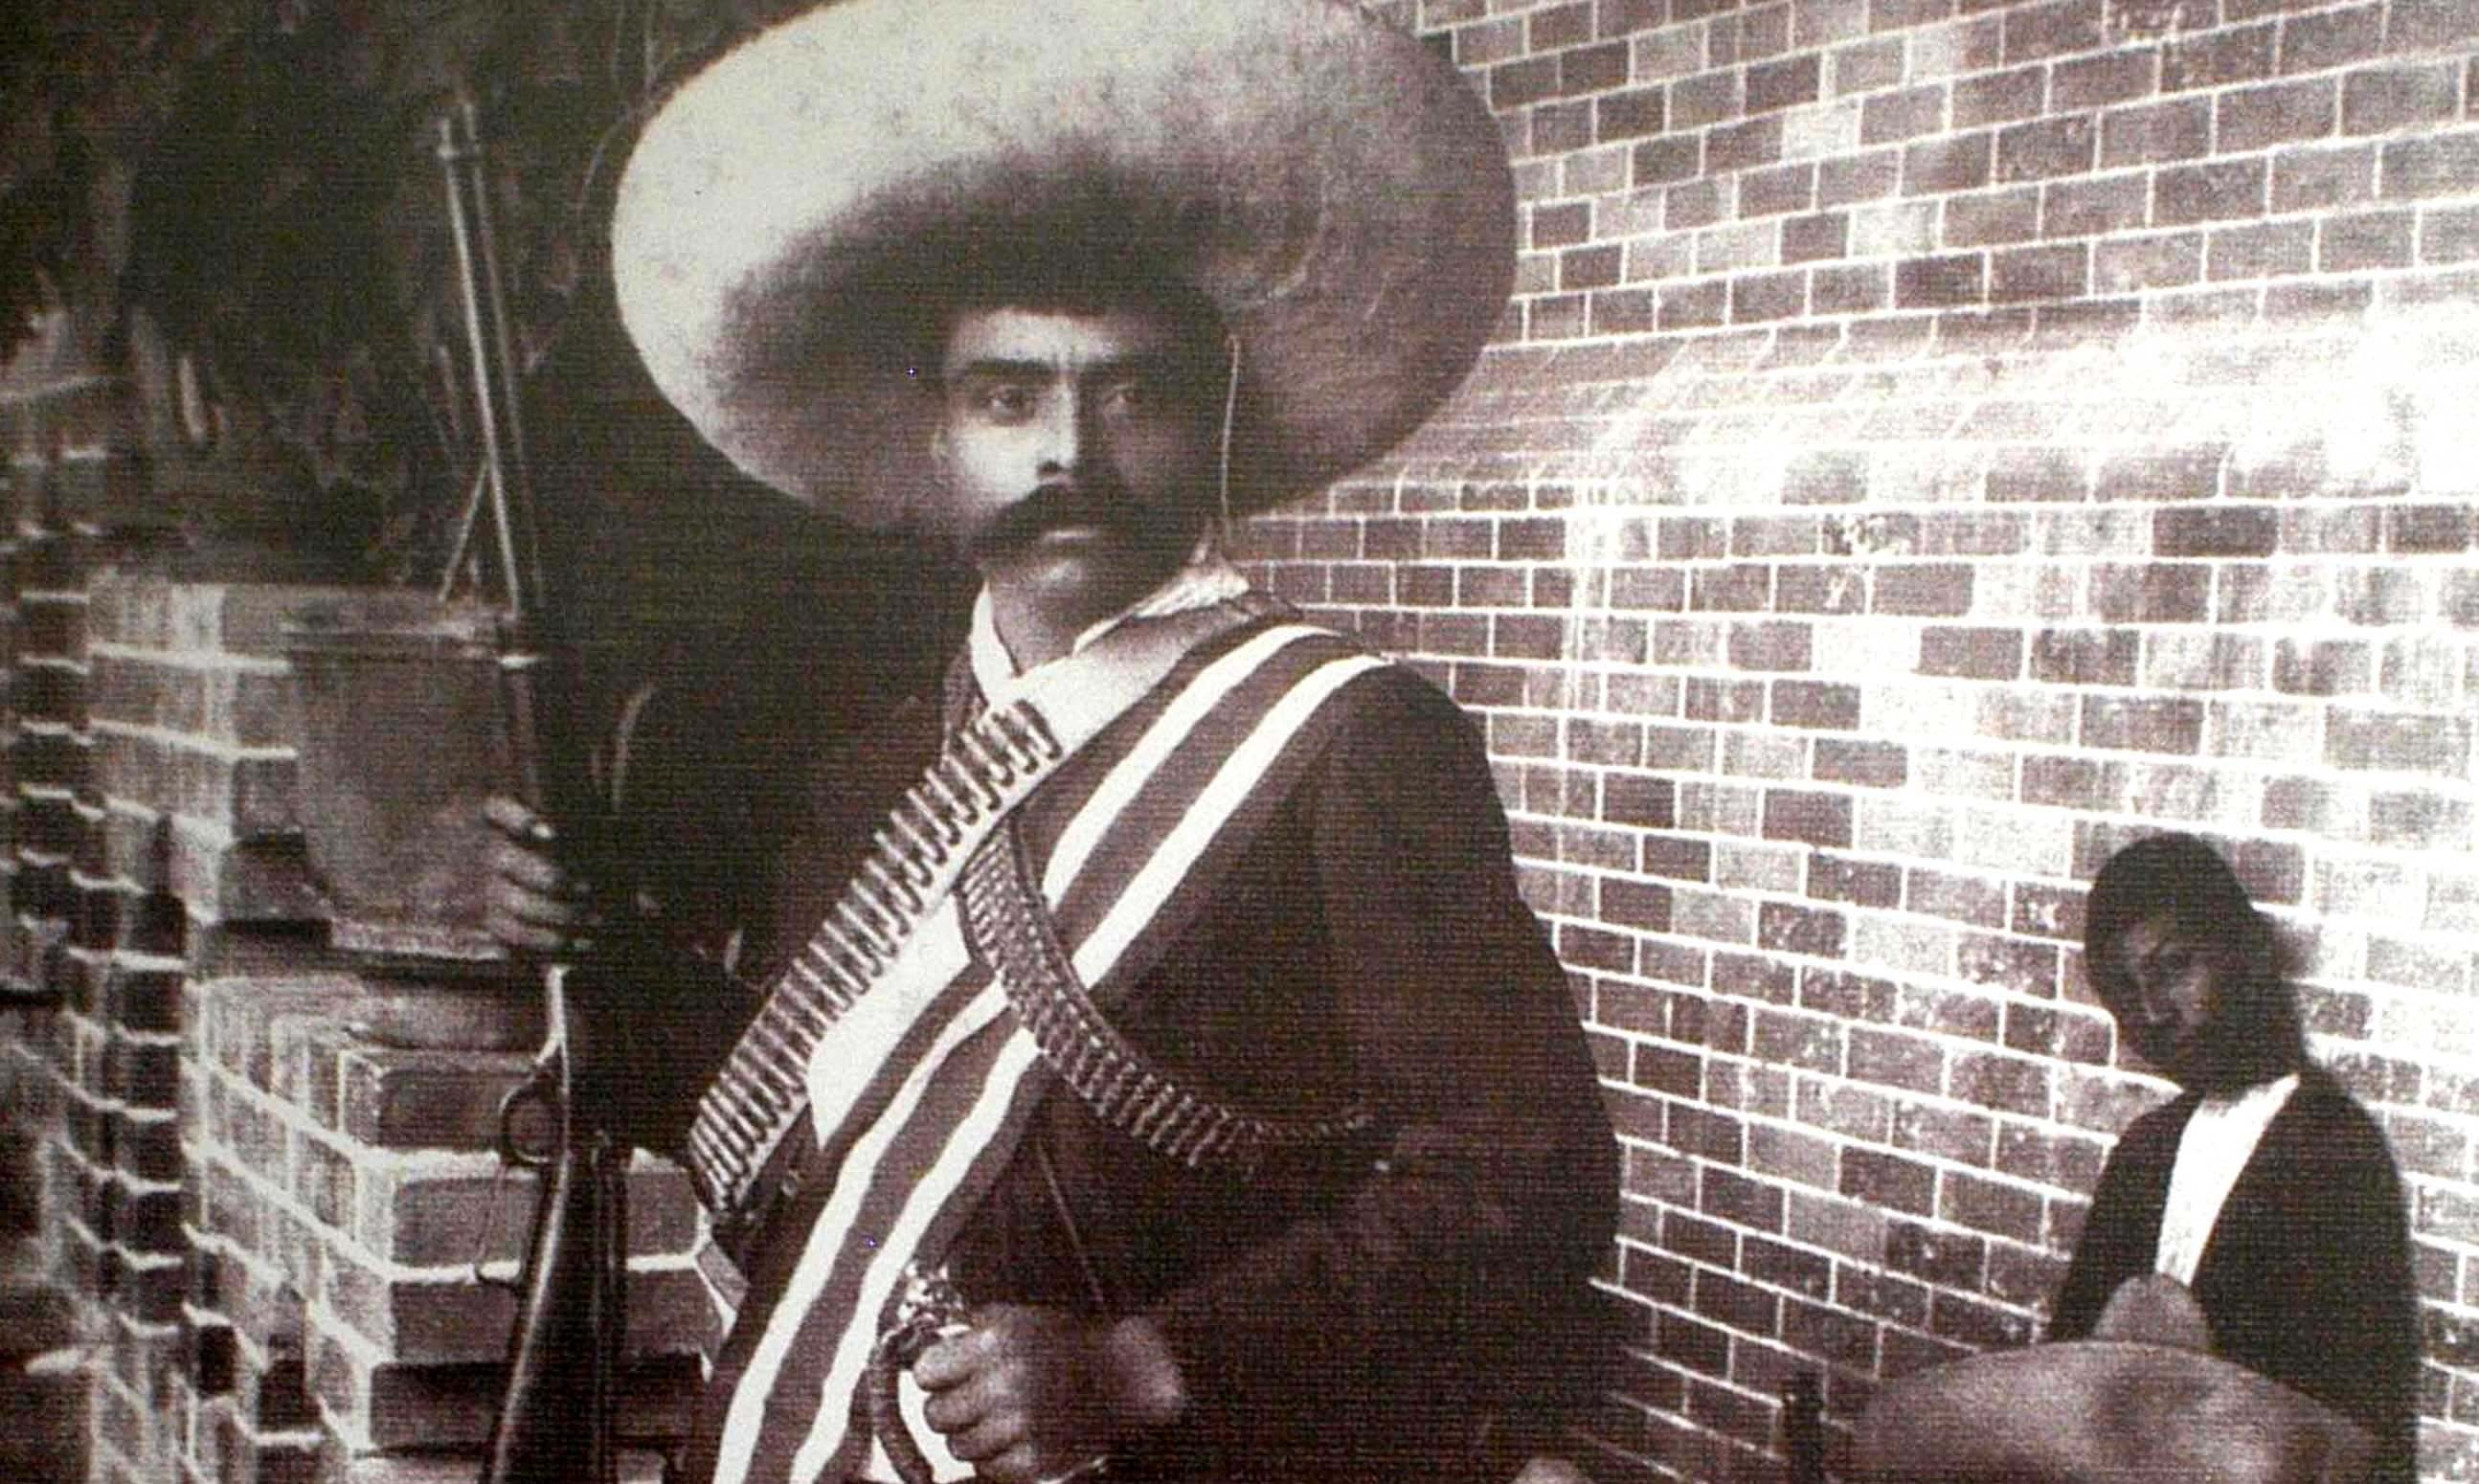 Fotos de la revolucion mexicana de 1910